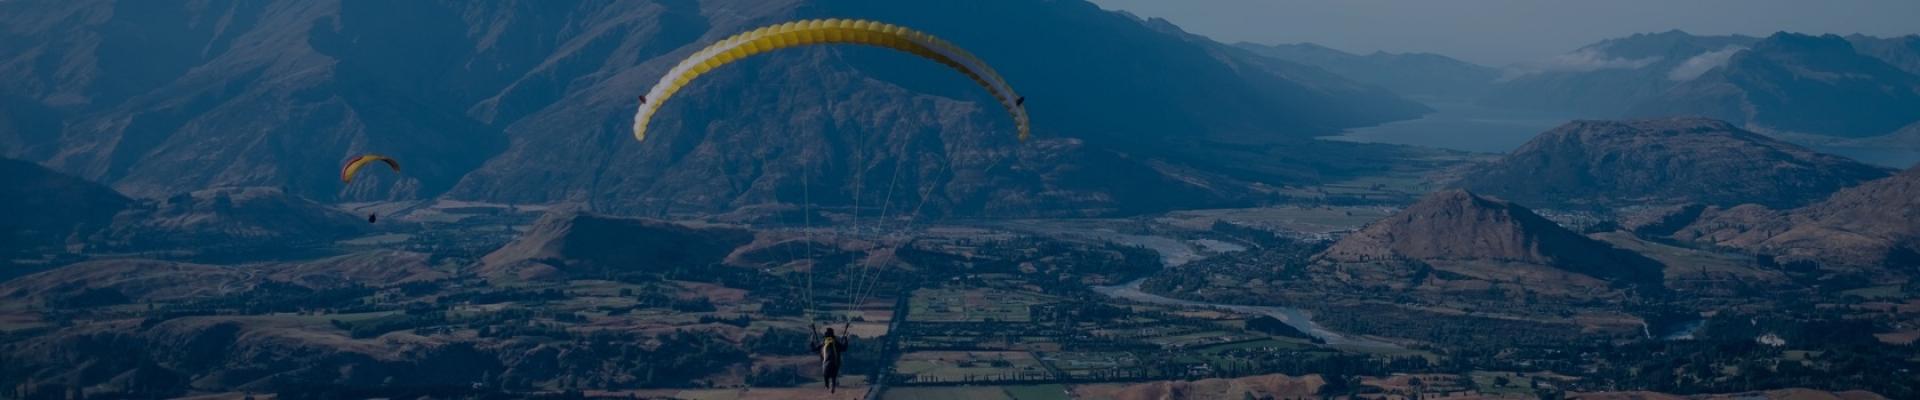 Paragliding in Kullu, Himachal Pradesh, India